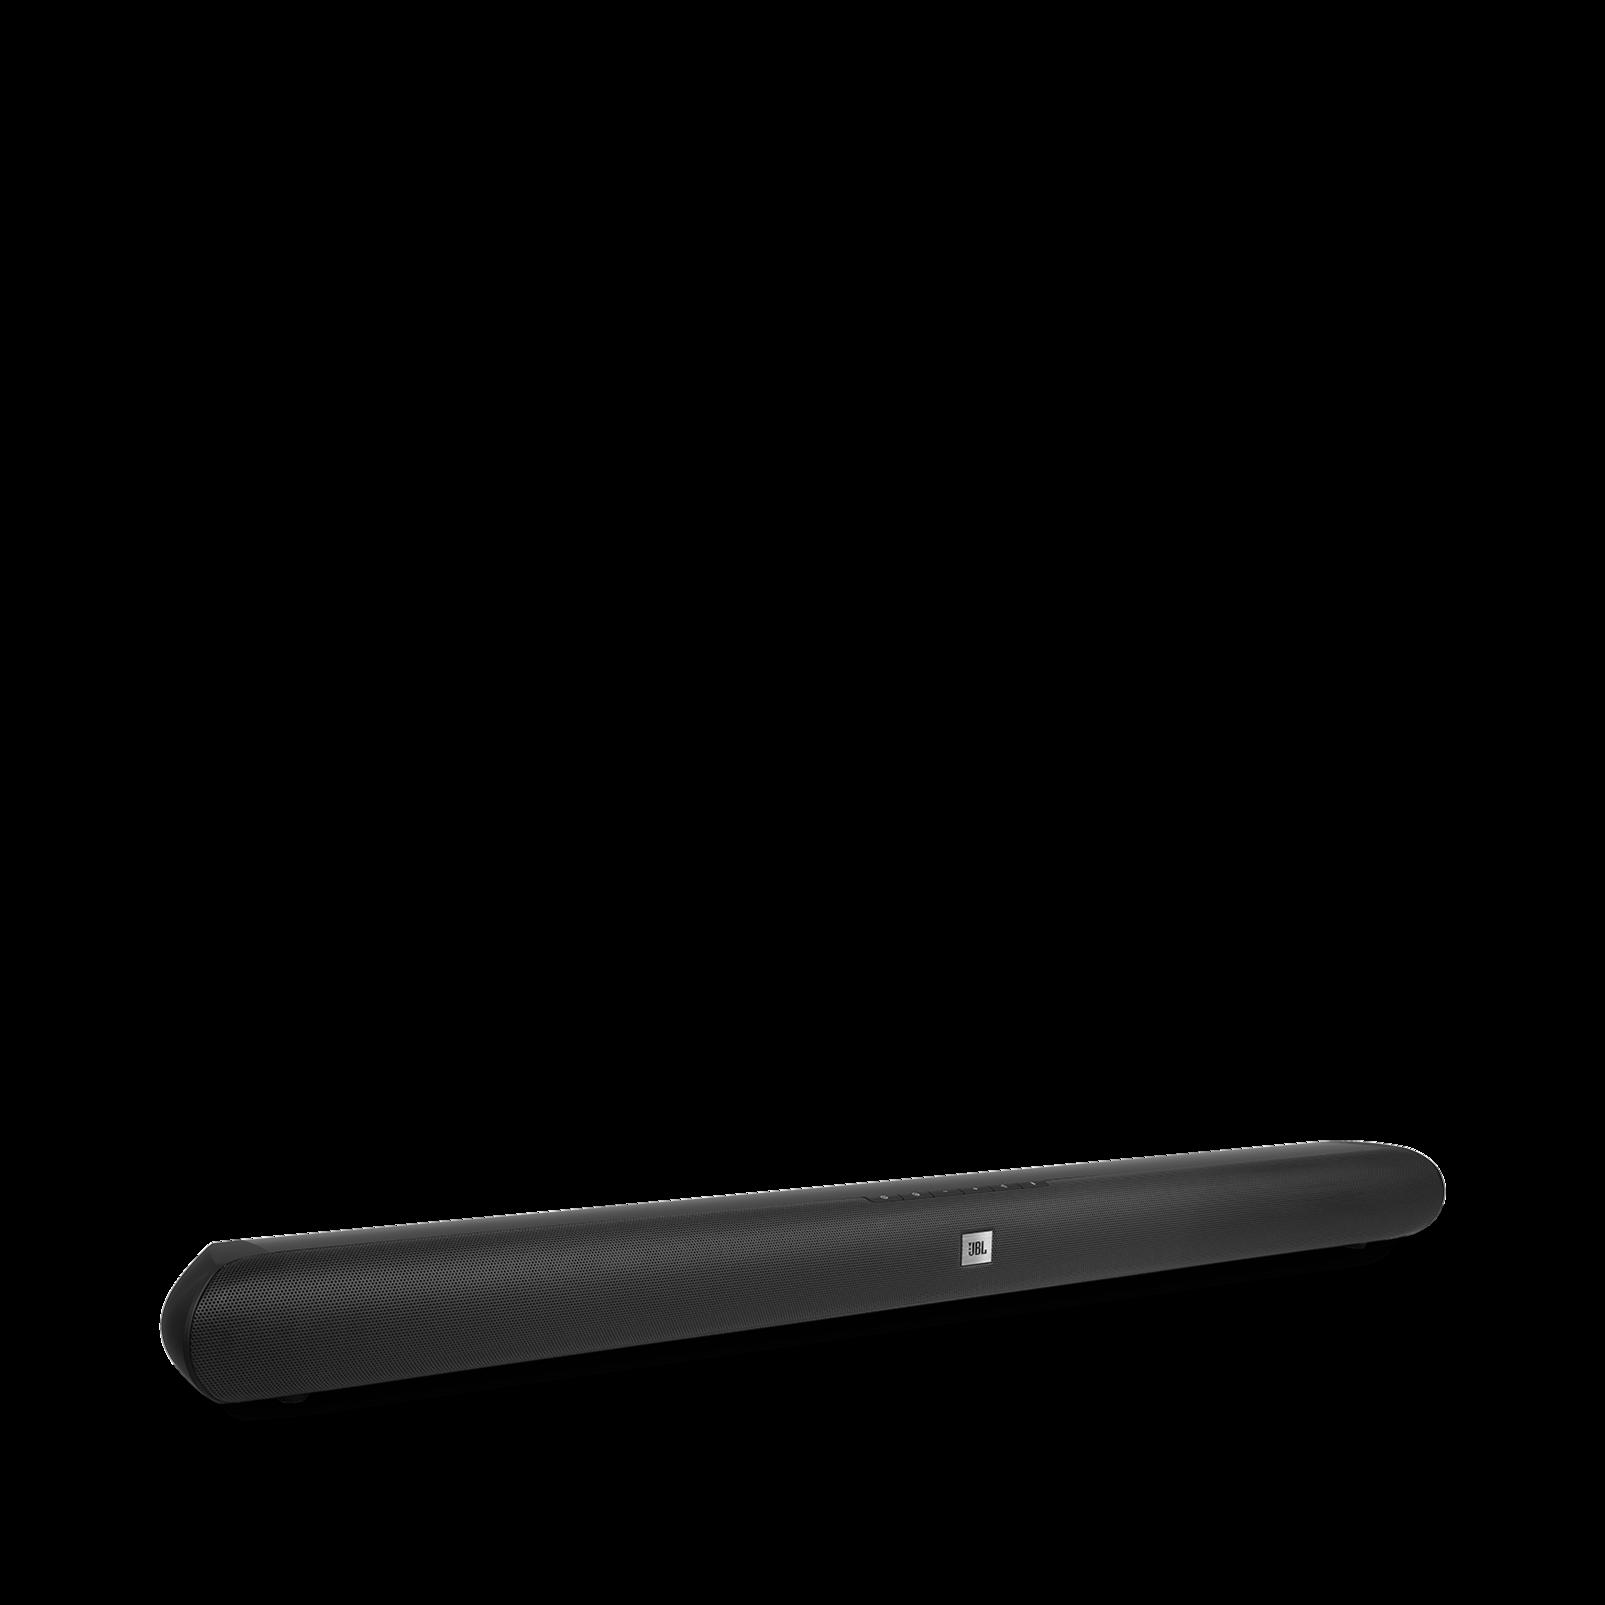 Cinema SB150 - Black - Home cinema 2.1 soundbar with compact wireless subwoofer - Detailshot 1